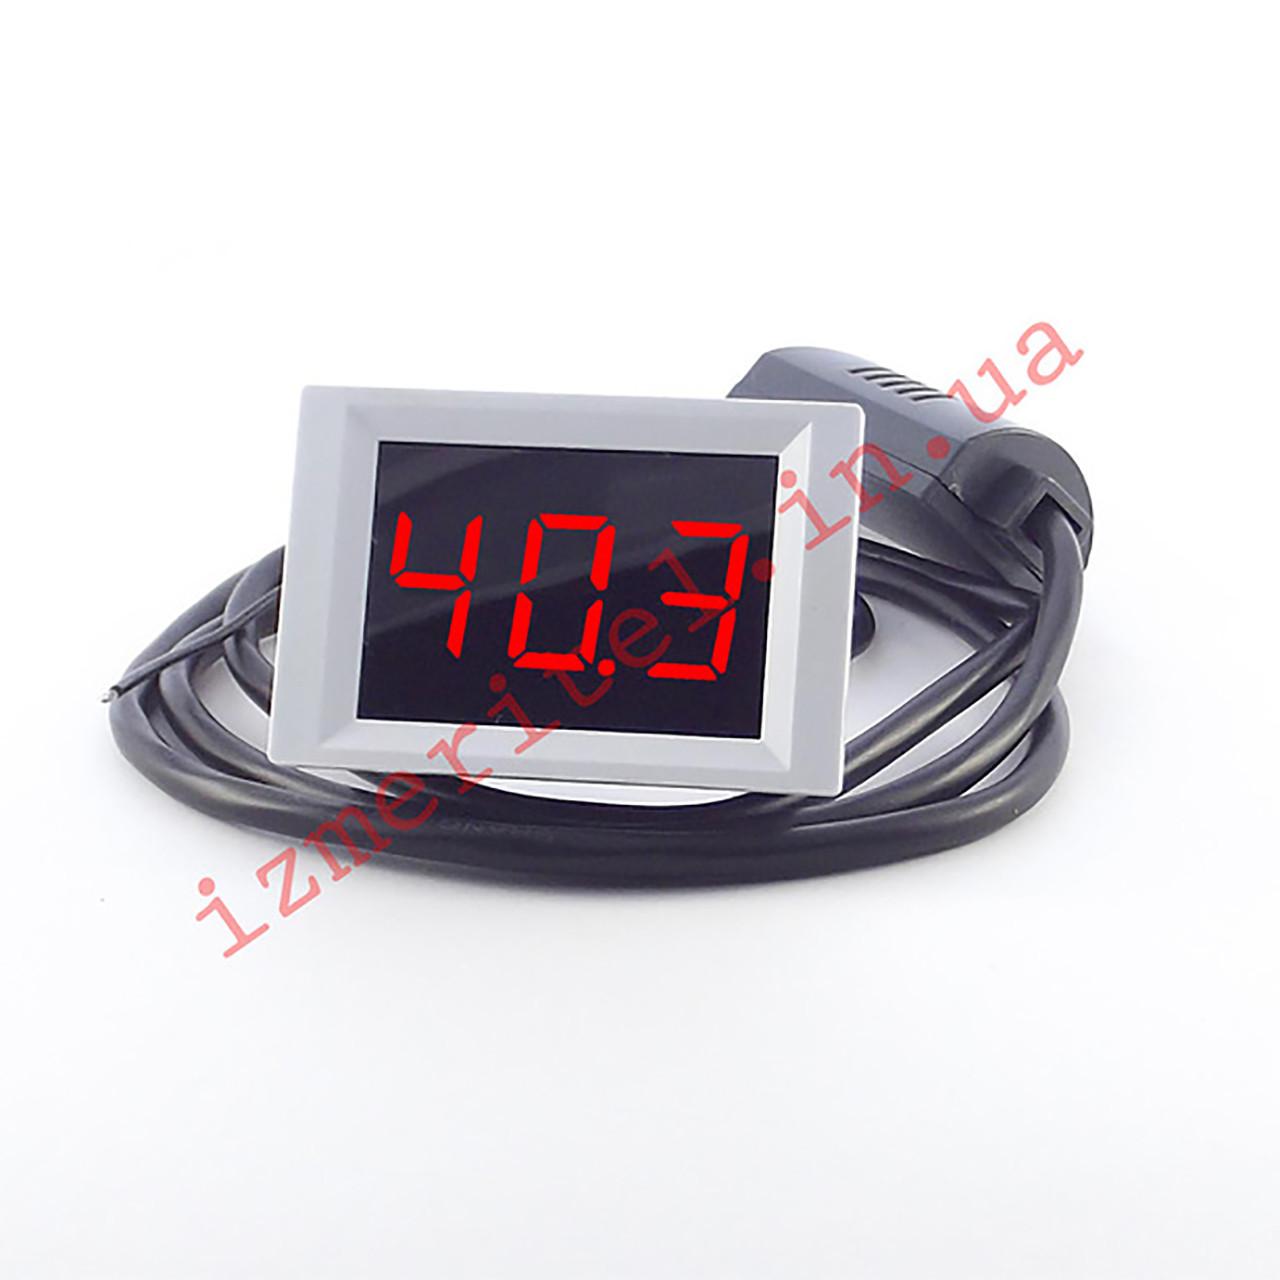 Цифровой гигрометр XH-B403 12v